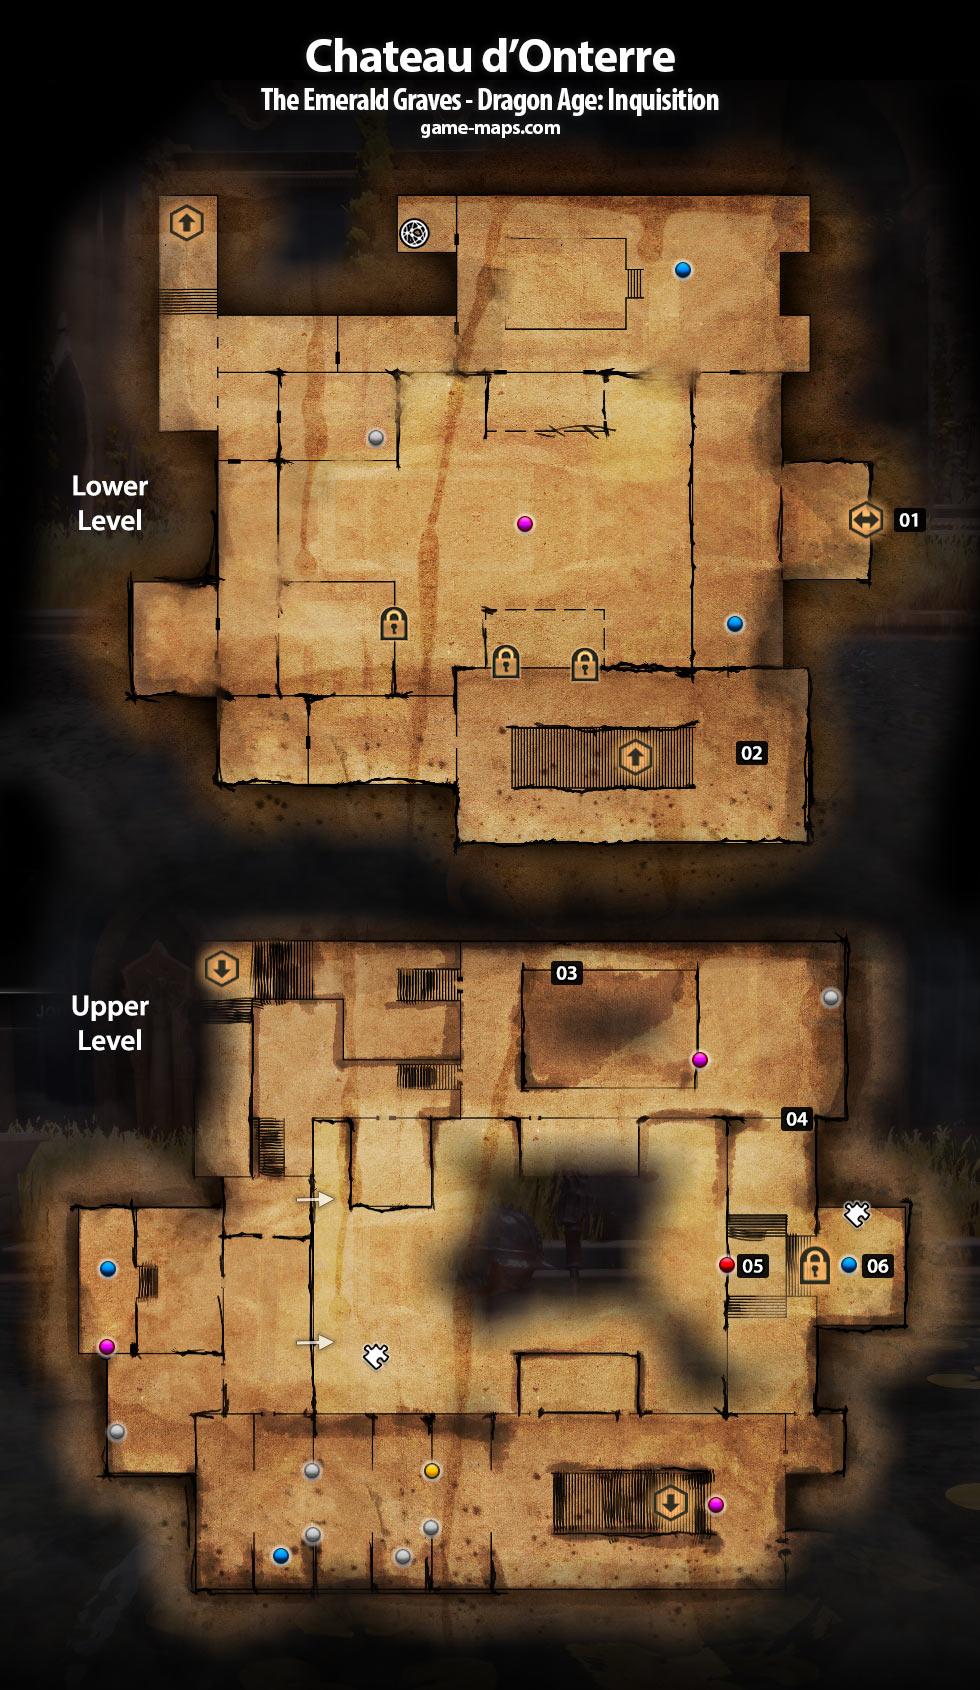 Chateau D Onterre Dragon Age Inquisition Game Maps Com